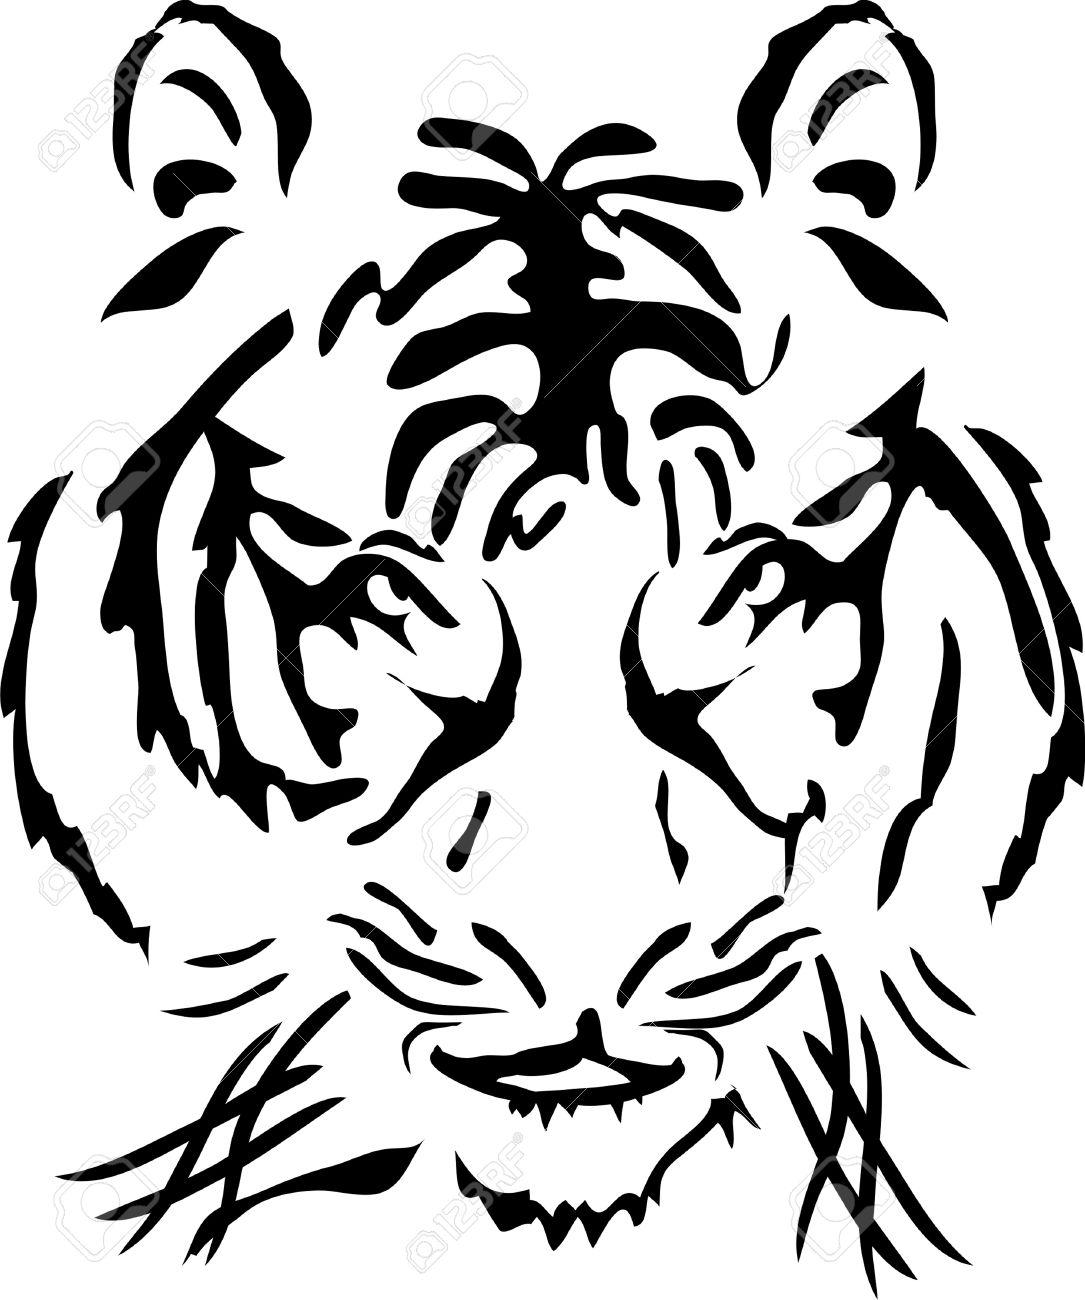 Tigre Bengala Clipart Download Tigre Bengala Clipart For